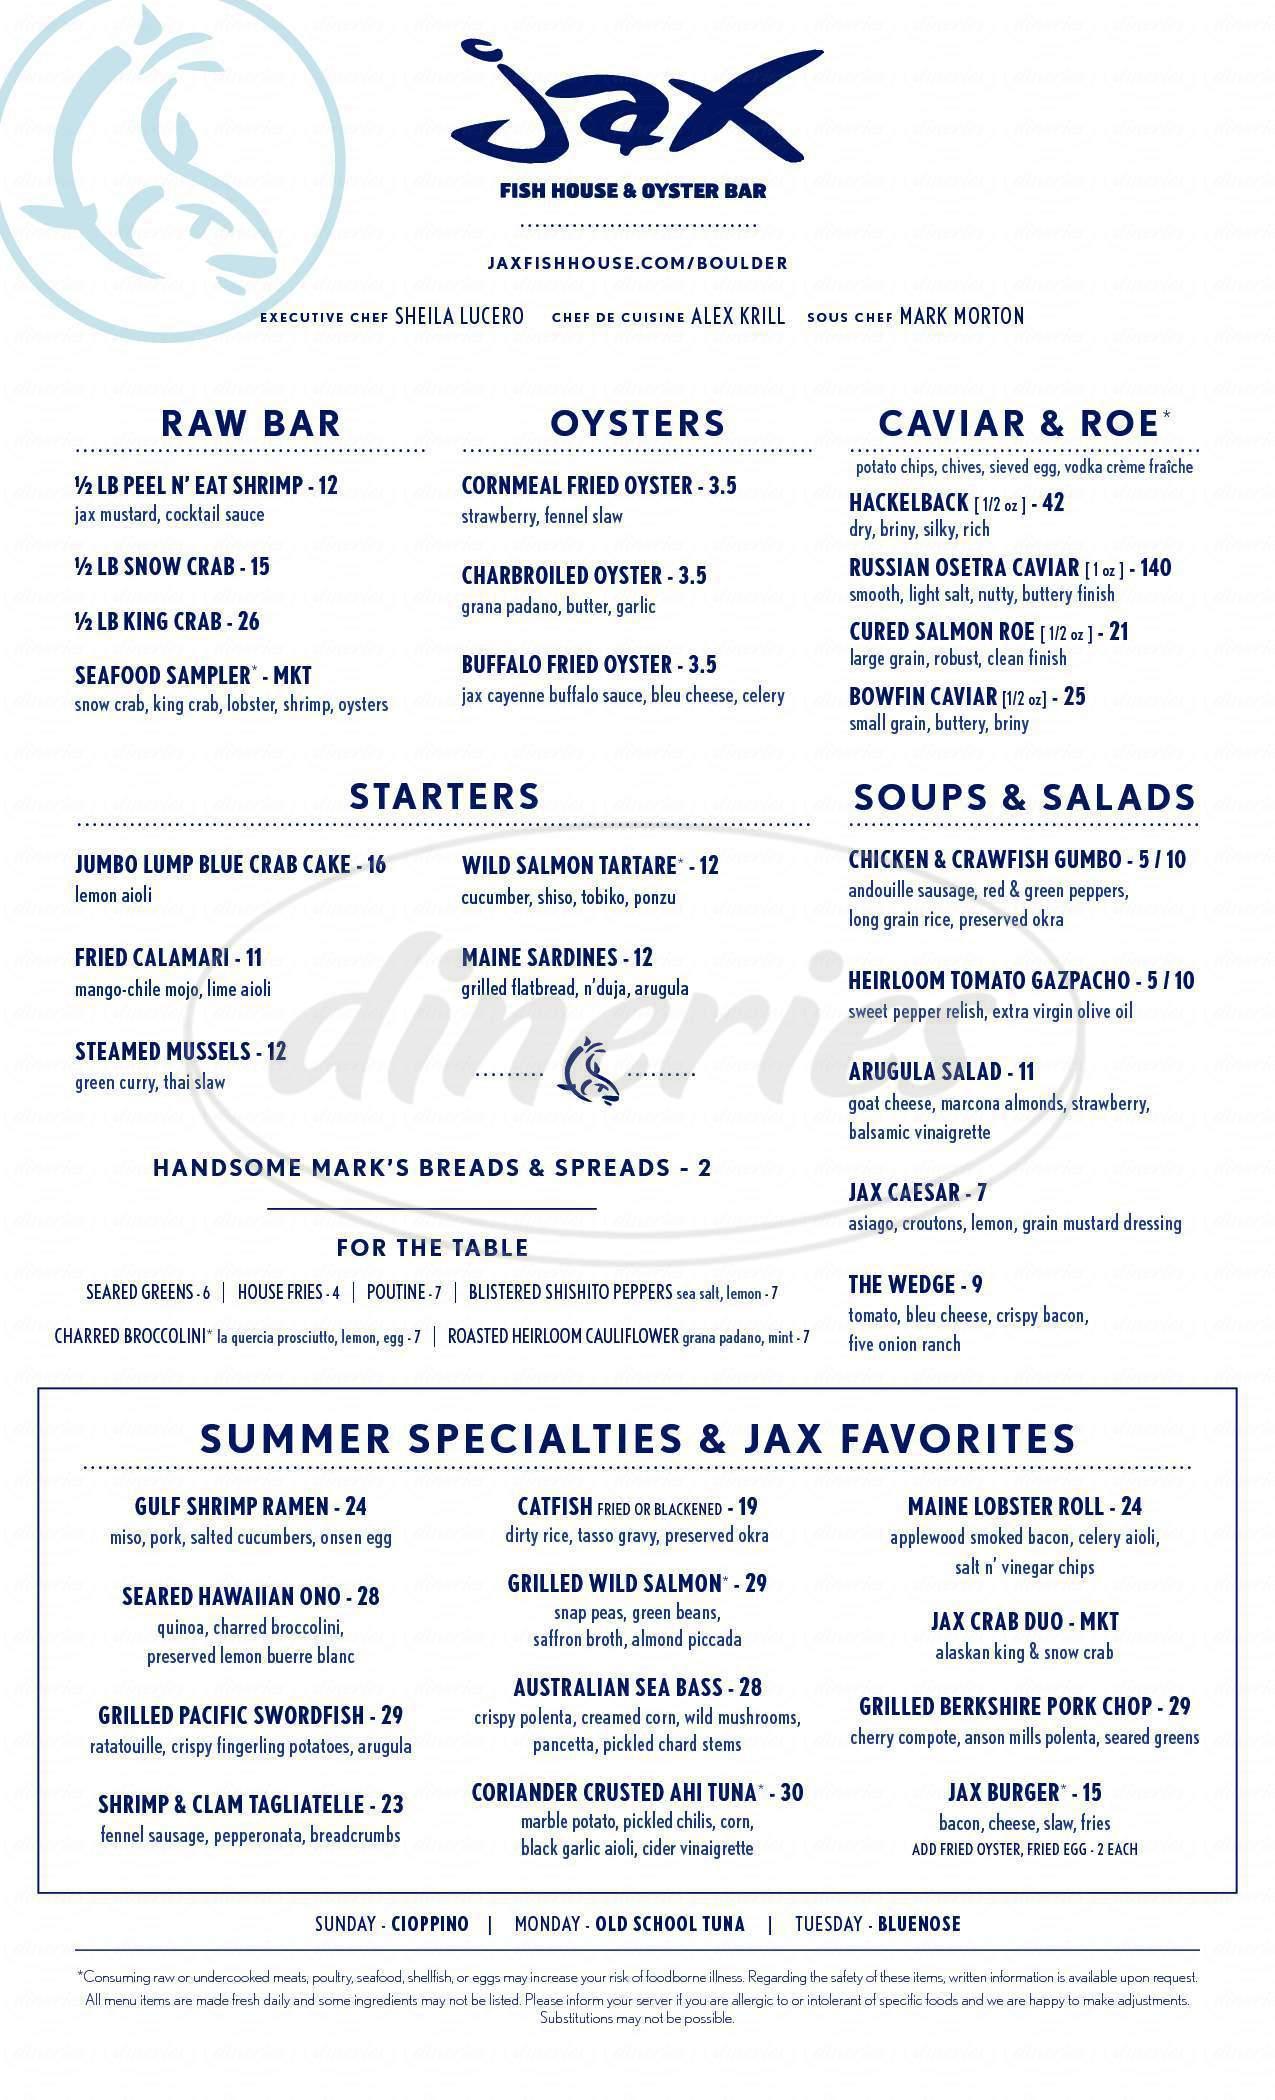 menu for Jax Fish House